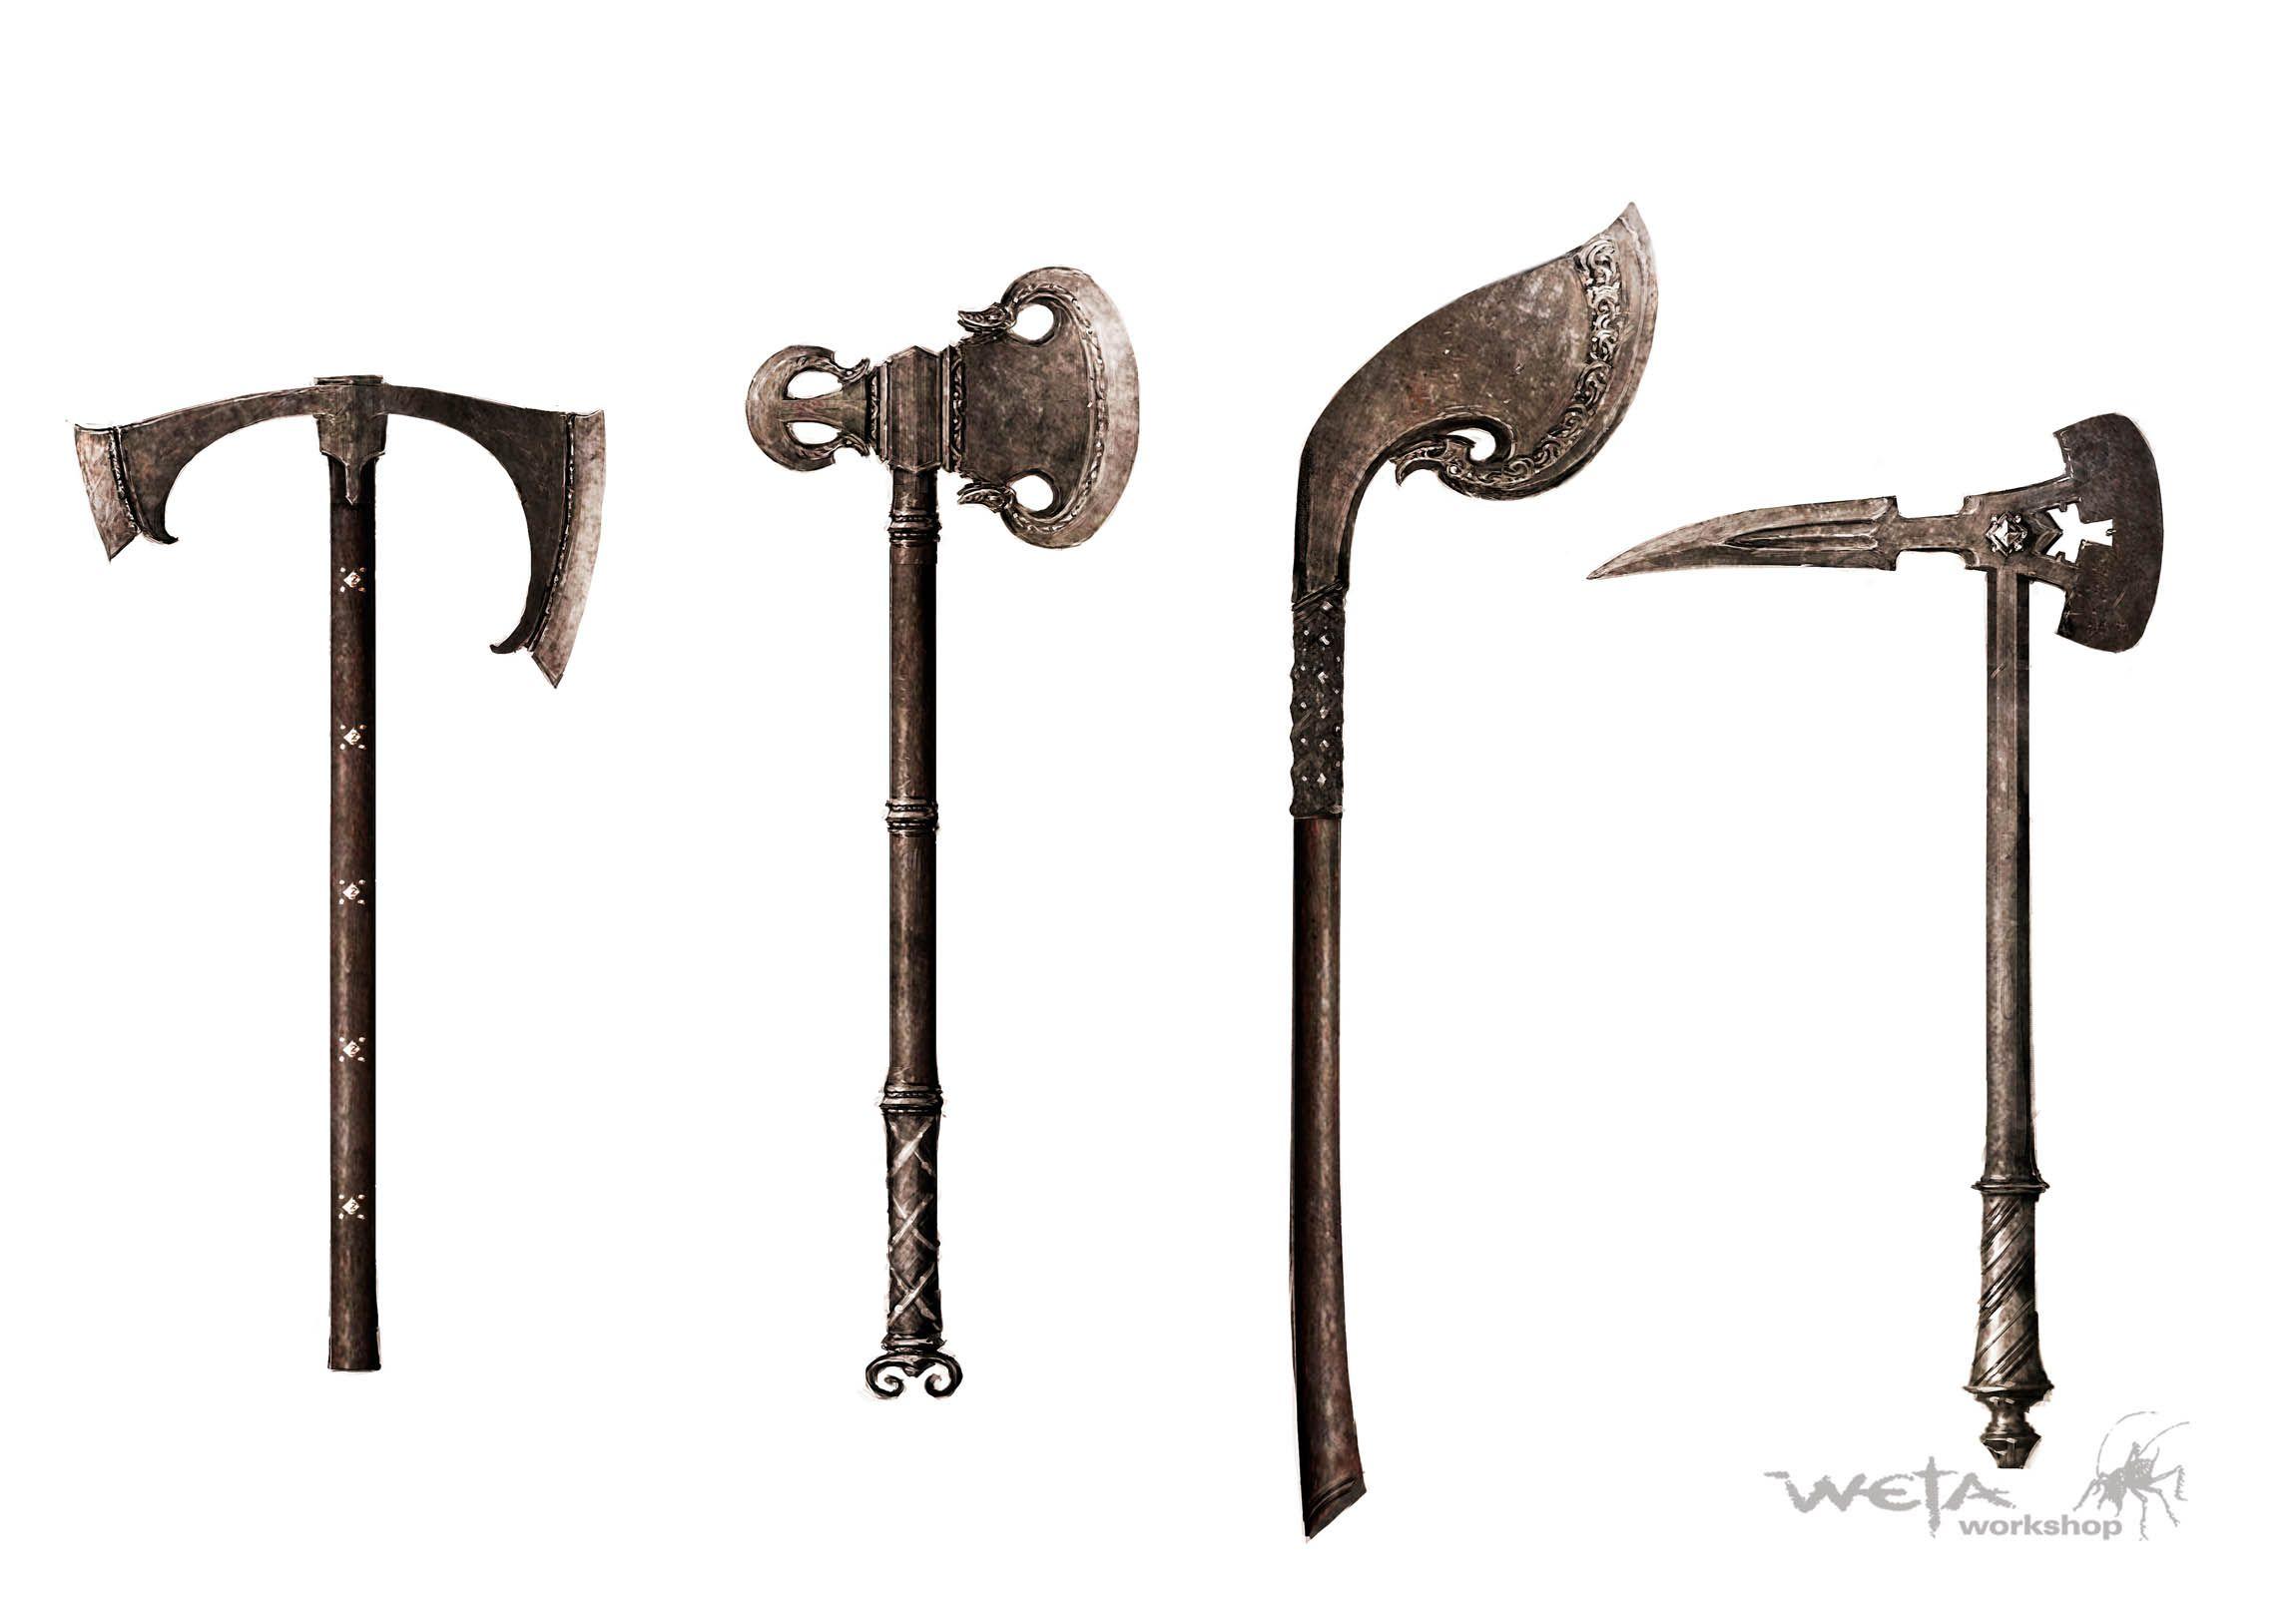 http://wetaworkshop.com/assets/Uploads/Hobbit-3/Hobbit-3-Design-WEPFeb-2015-007.jpg